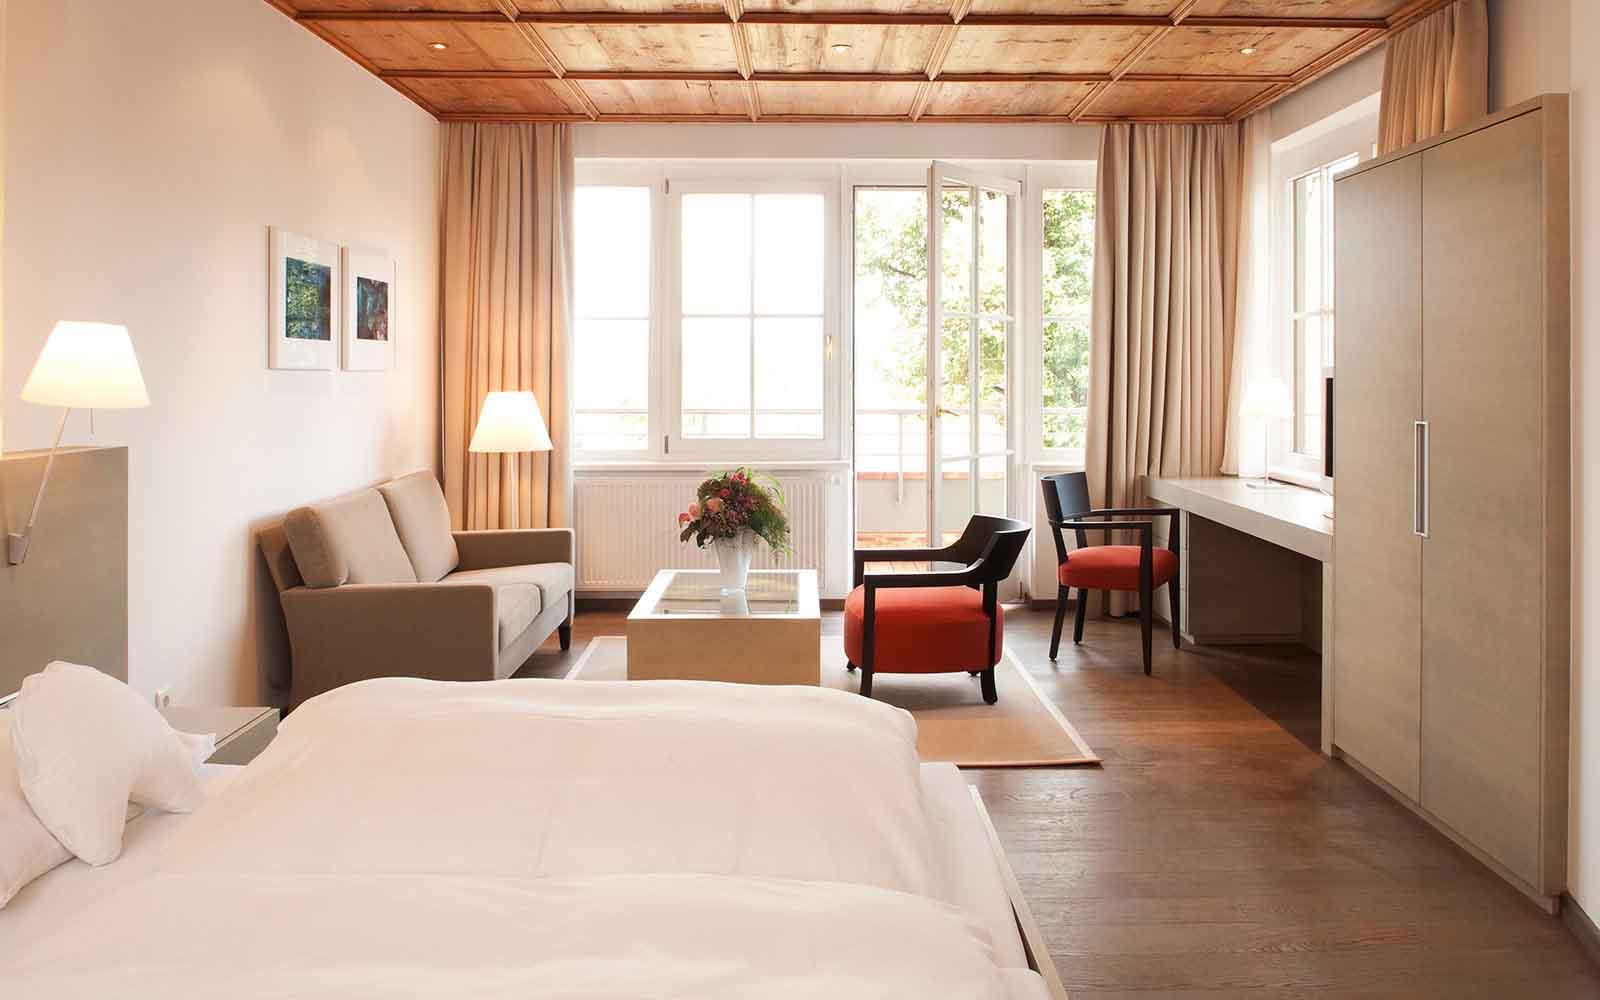 Real results Park Igls Tyrol Austria Hotel Health & Wellbeing